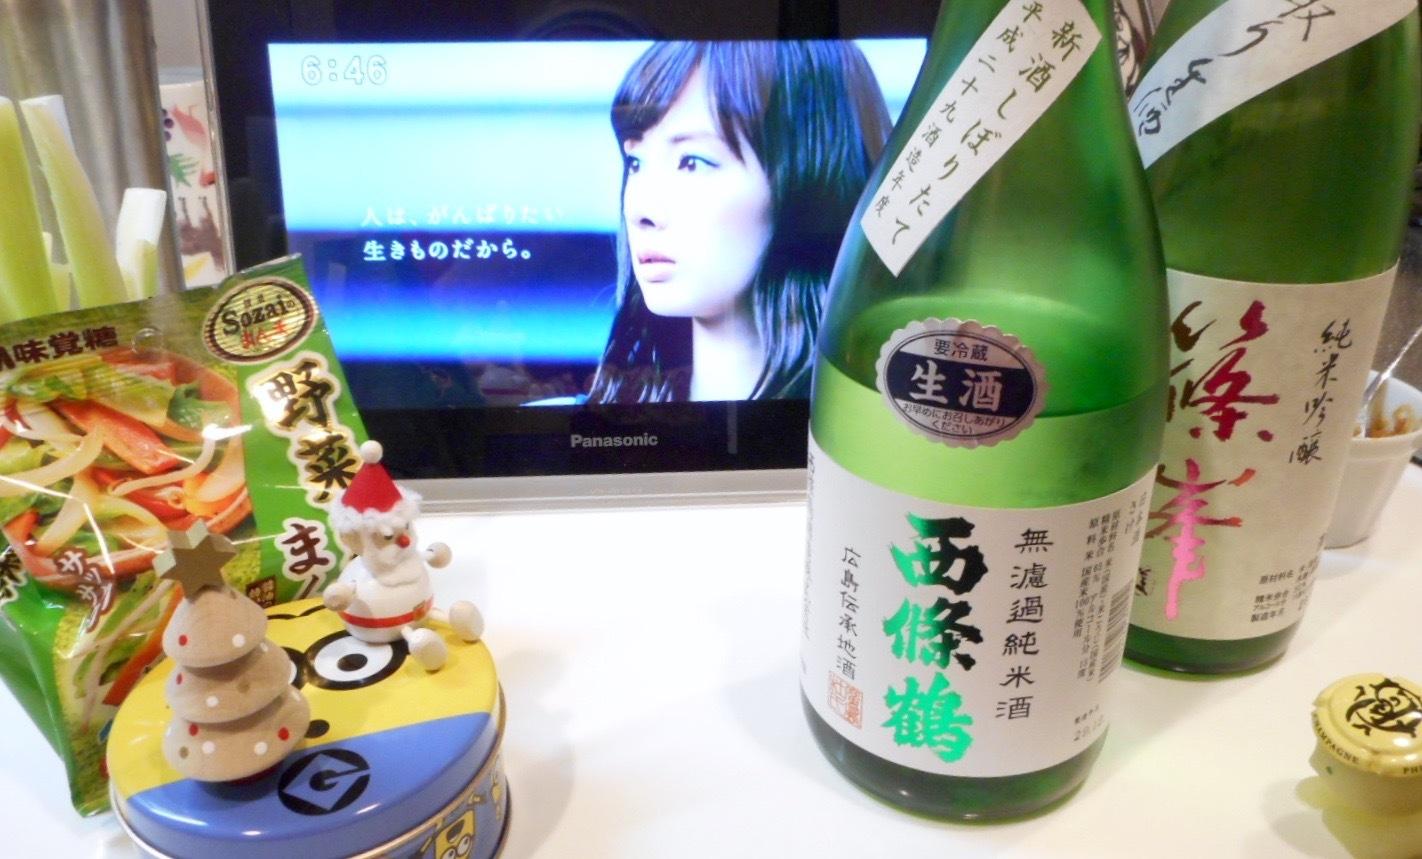 saijoutsuru_siboritate29by8.jpg